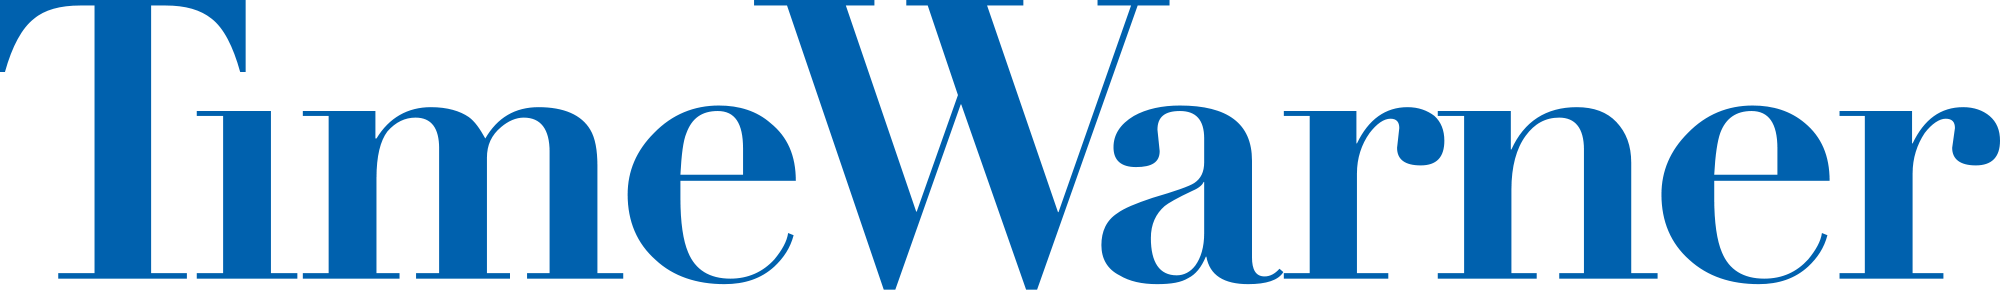 Numbers TV series  Wikipedia